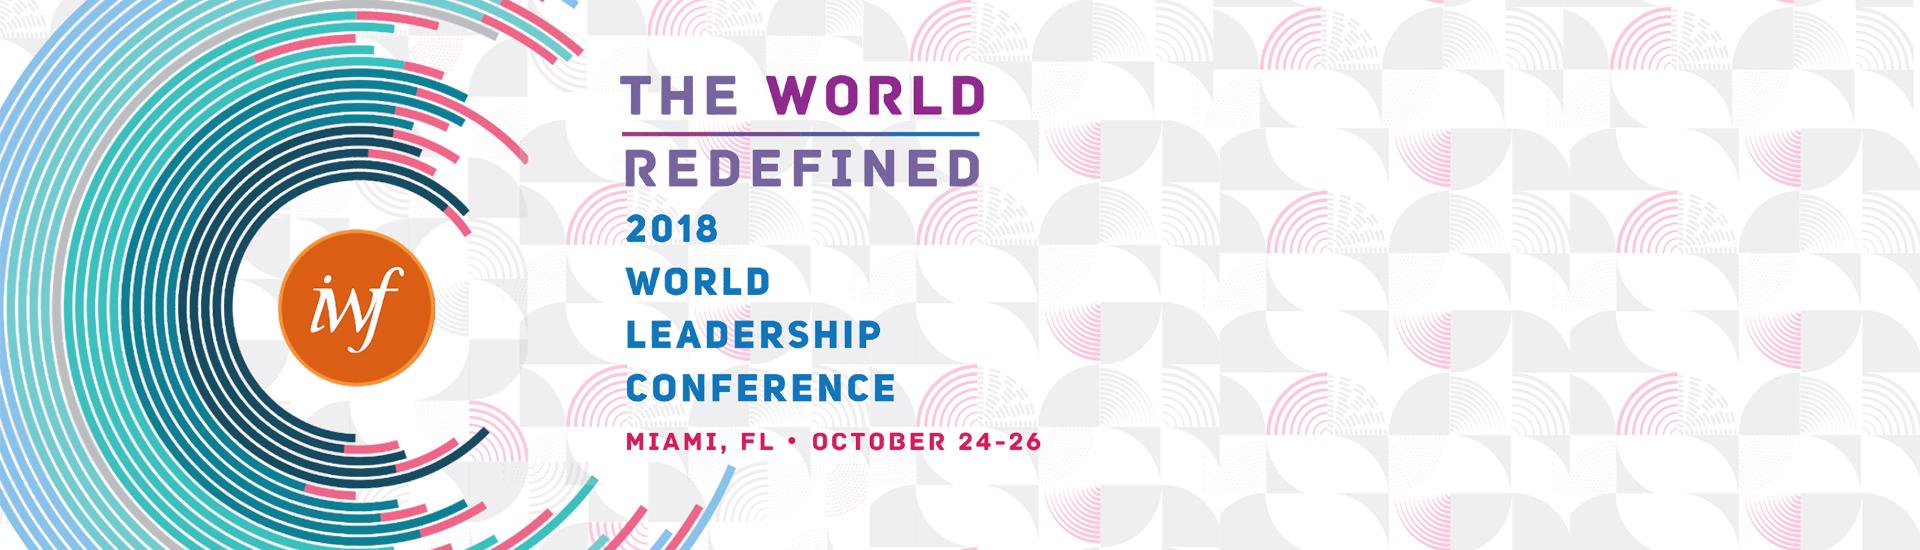 2018 World Leadership Conference